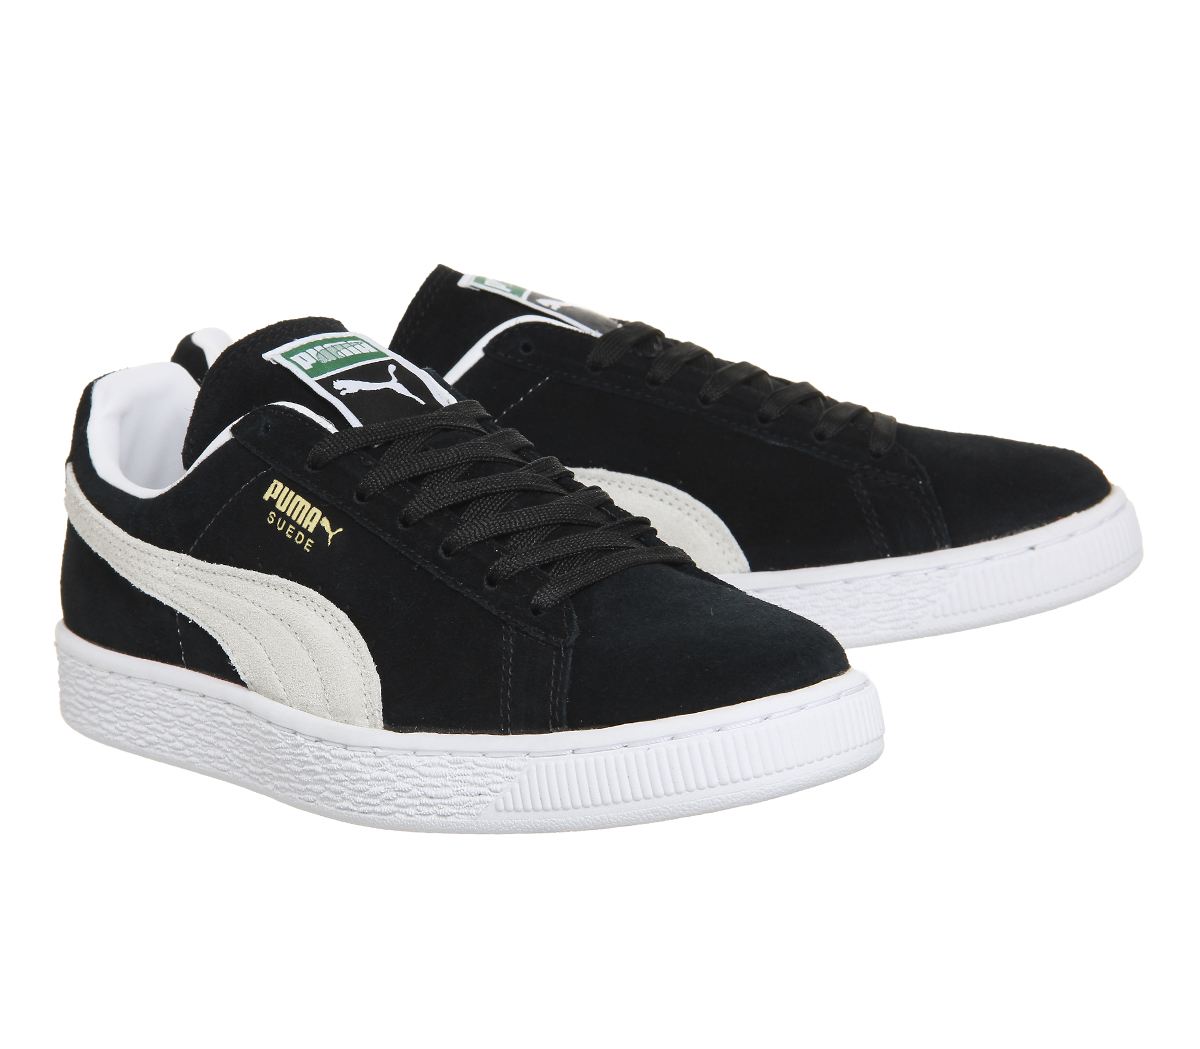 Sentinel Mens Puma Suede Classic BLACK WHITE Trainers Shoes 3c9a0a8c3